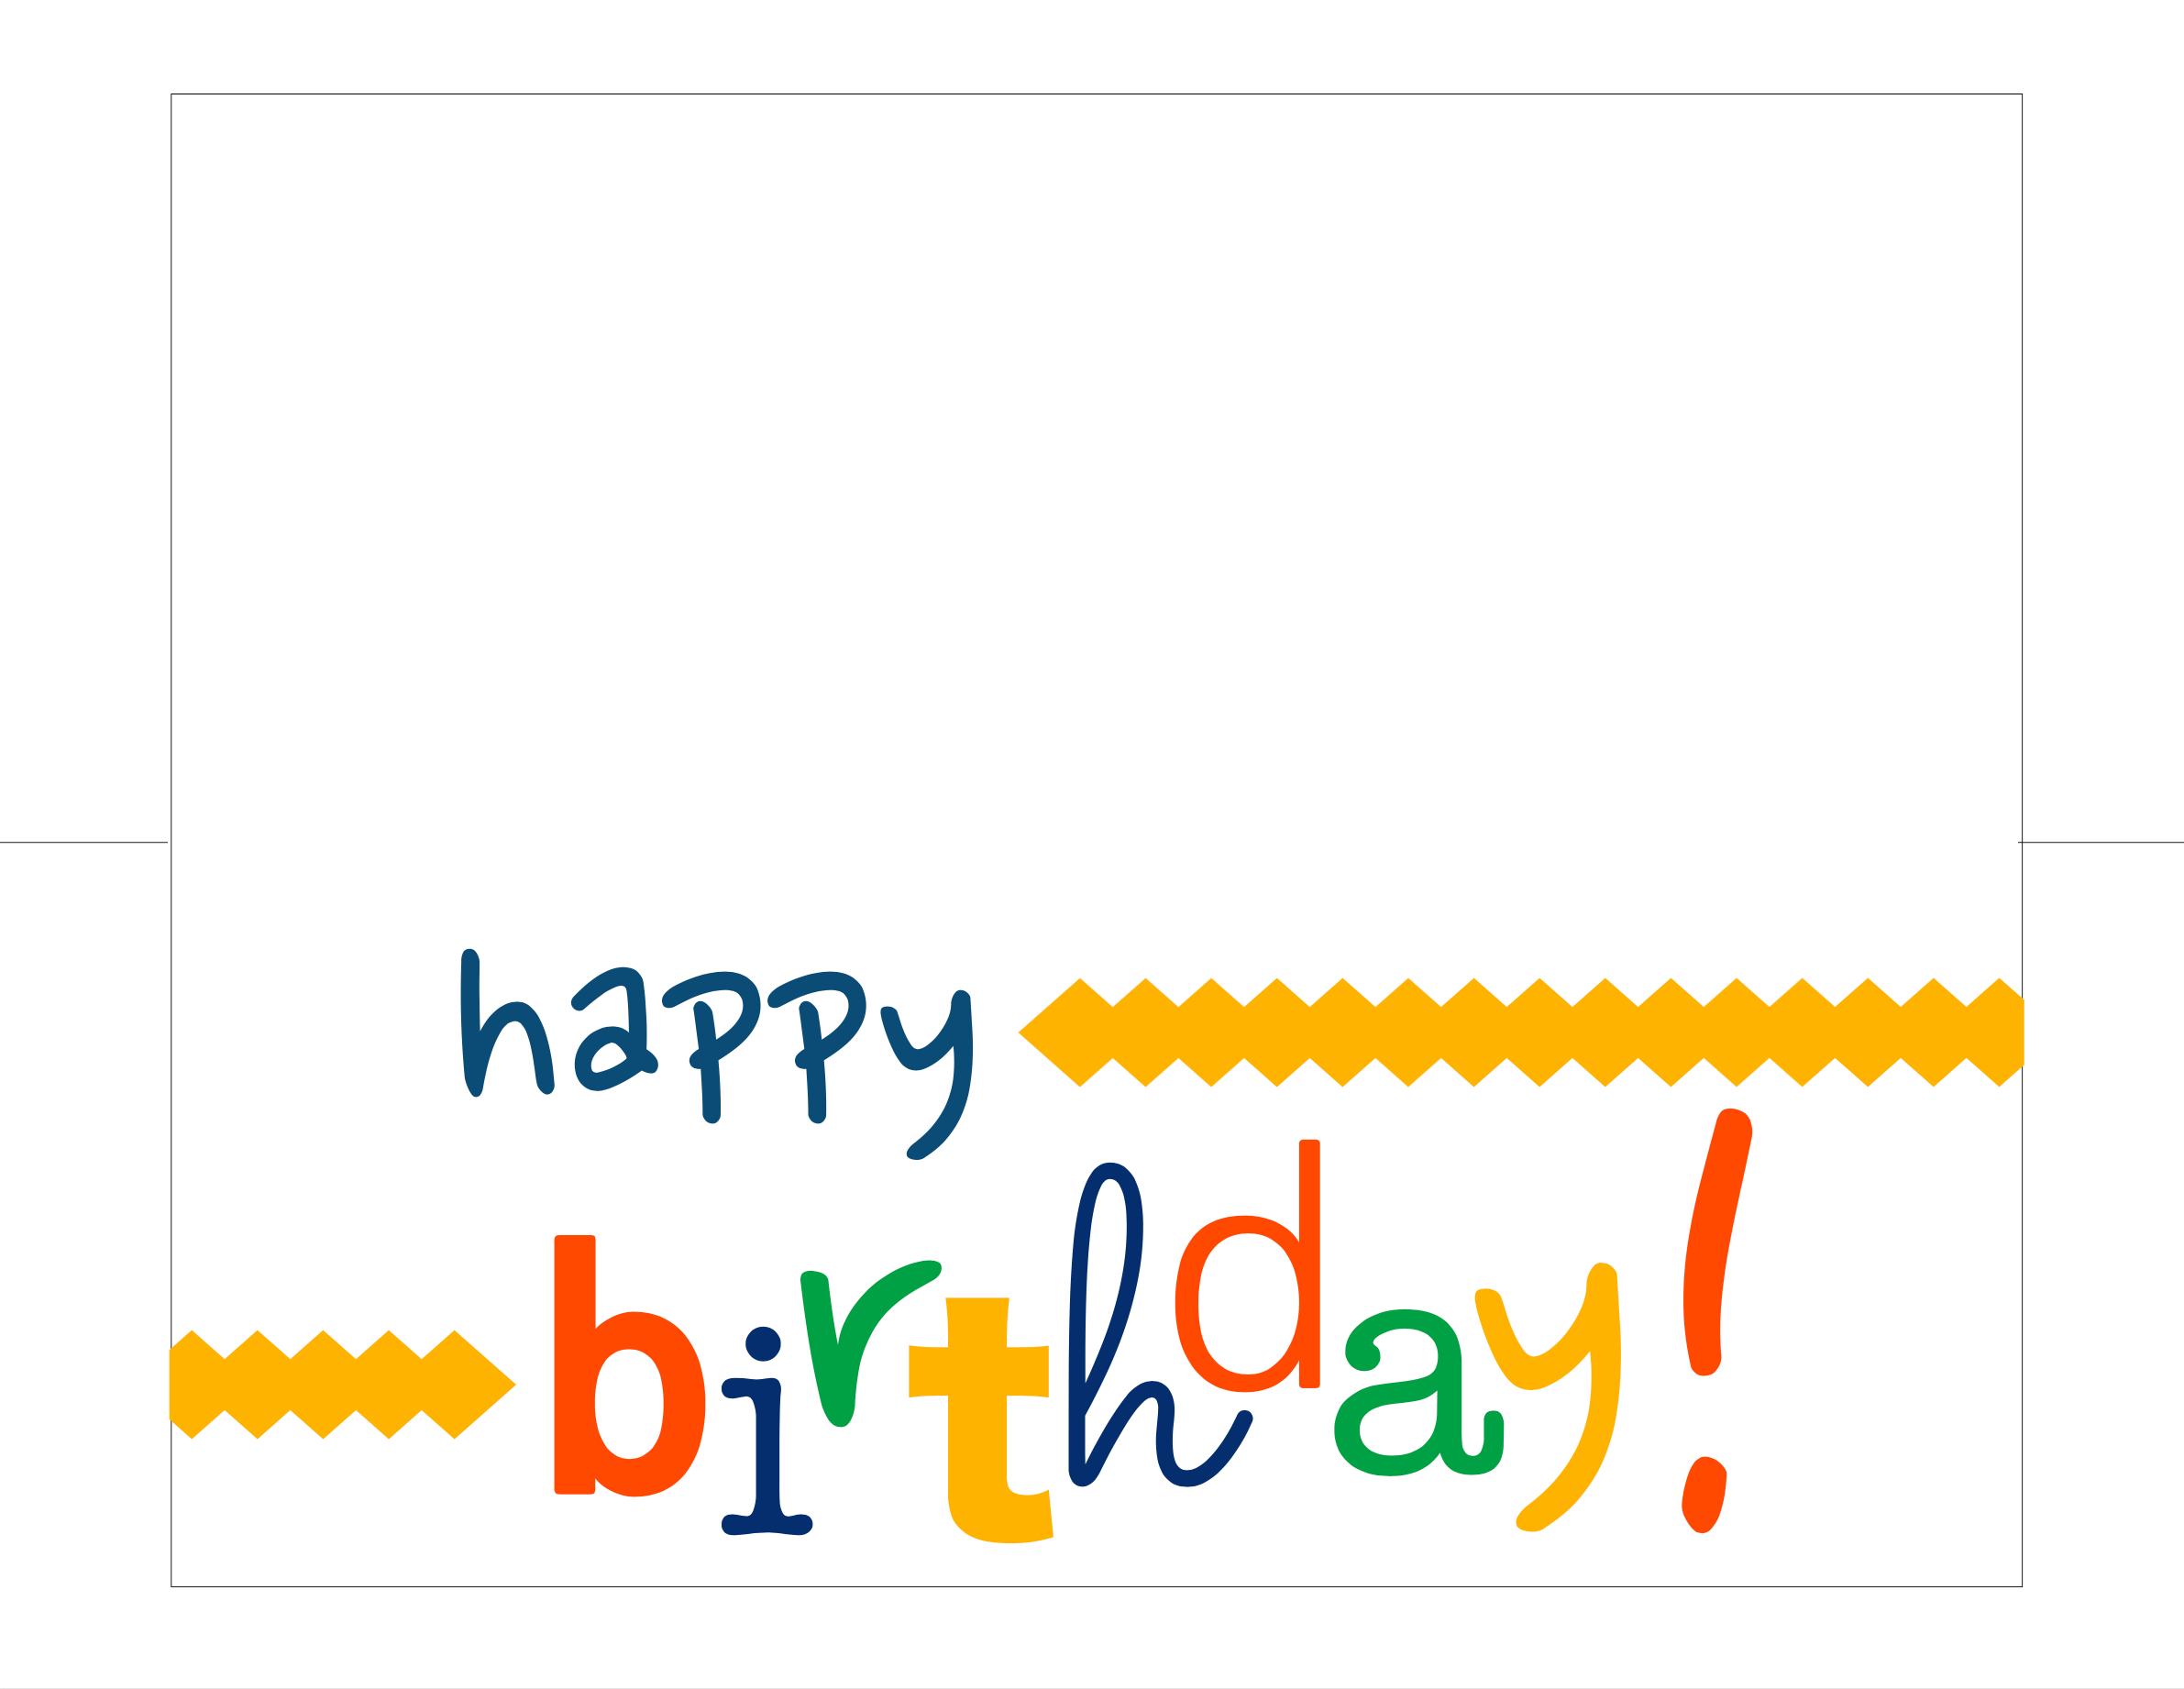 Happy Birthday Card Free Printable - - Free Printable Cards